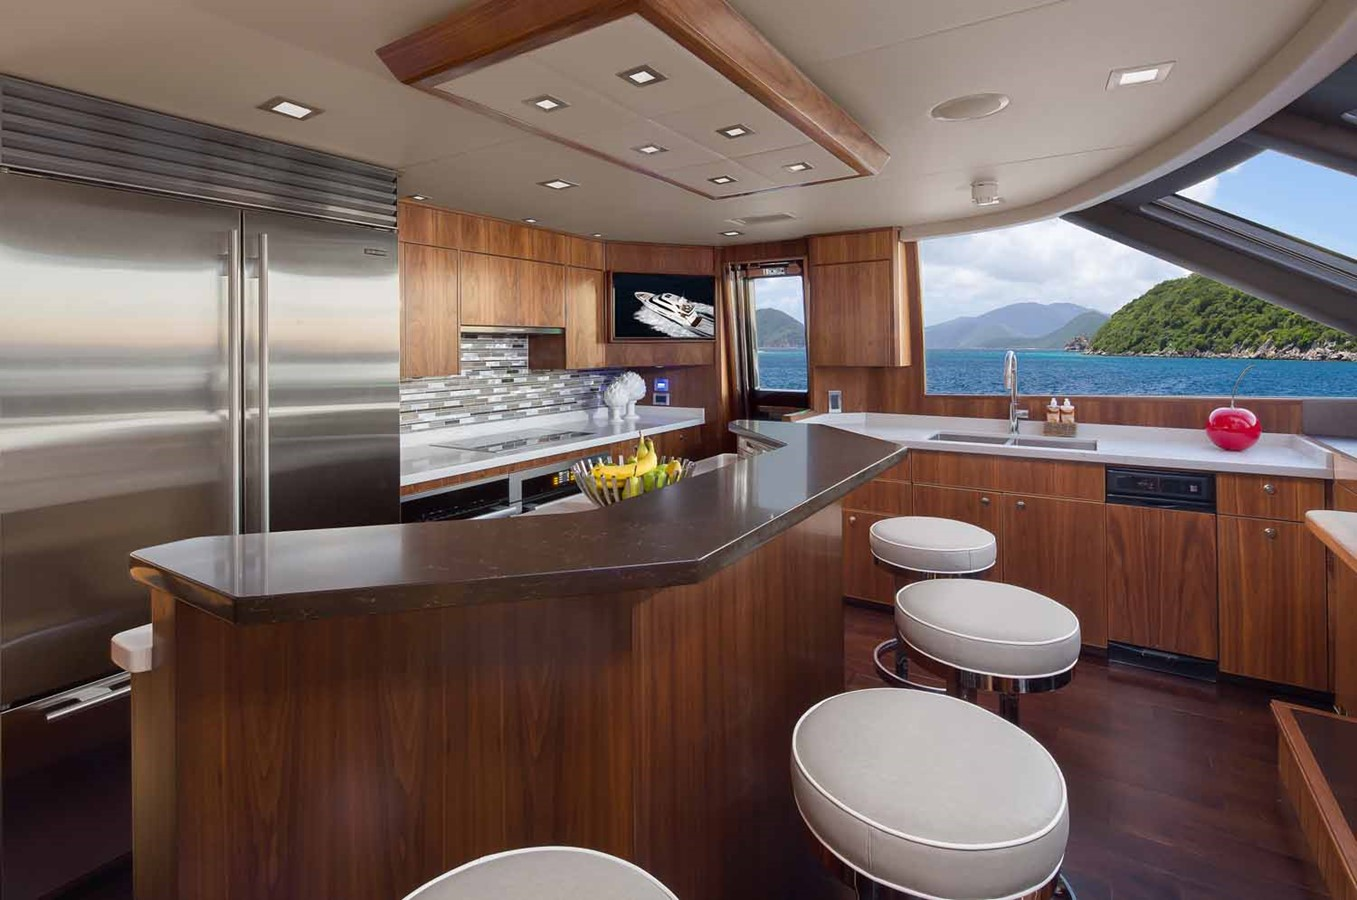 2019 VIKING Enclosed Bridge Motor Yacht 2464001